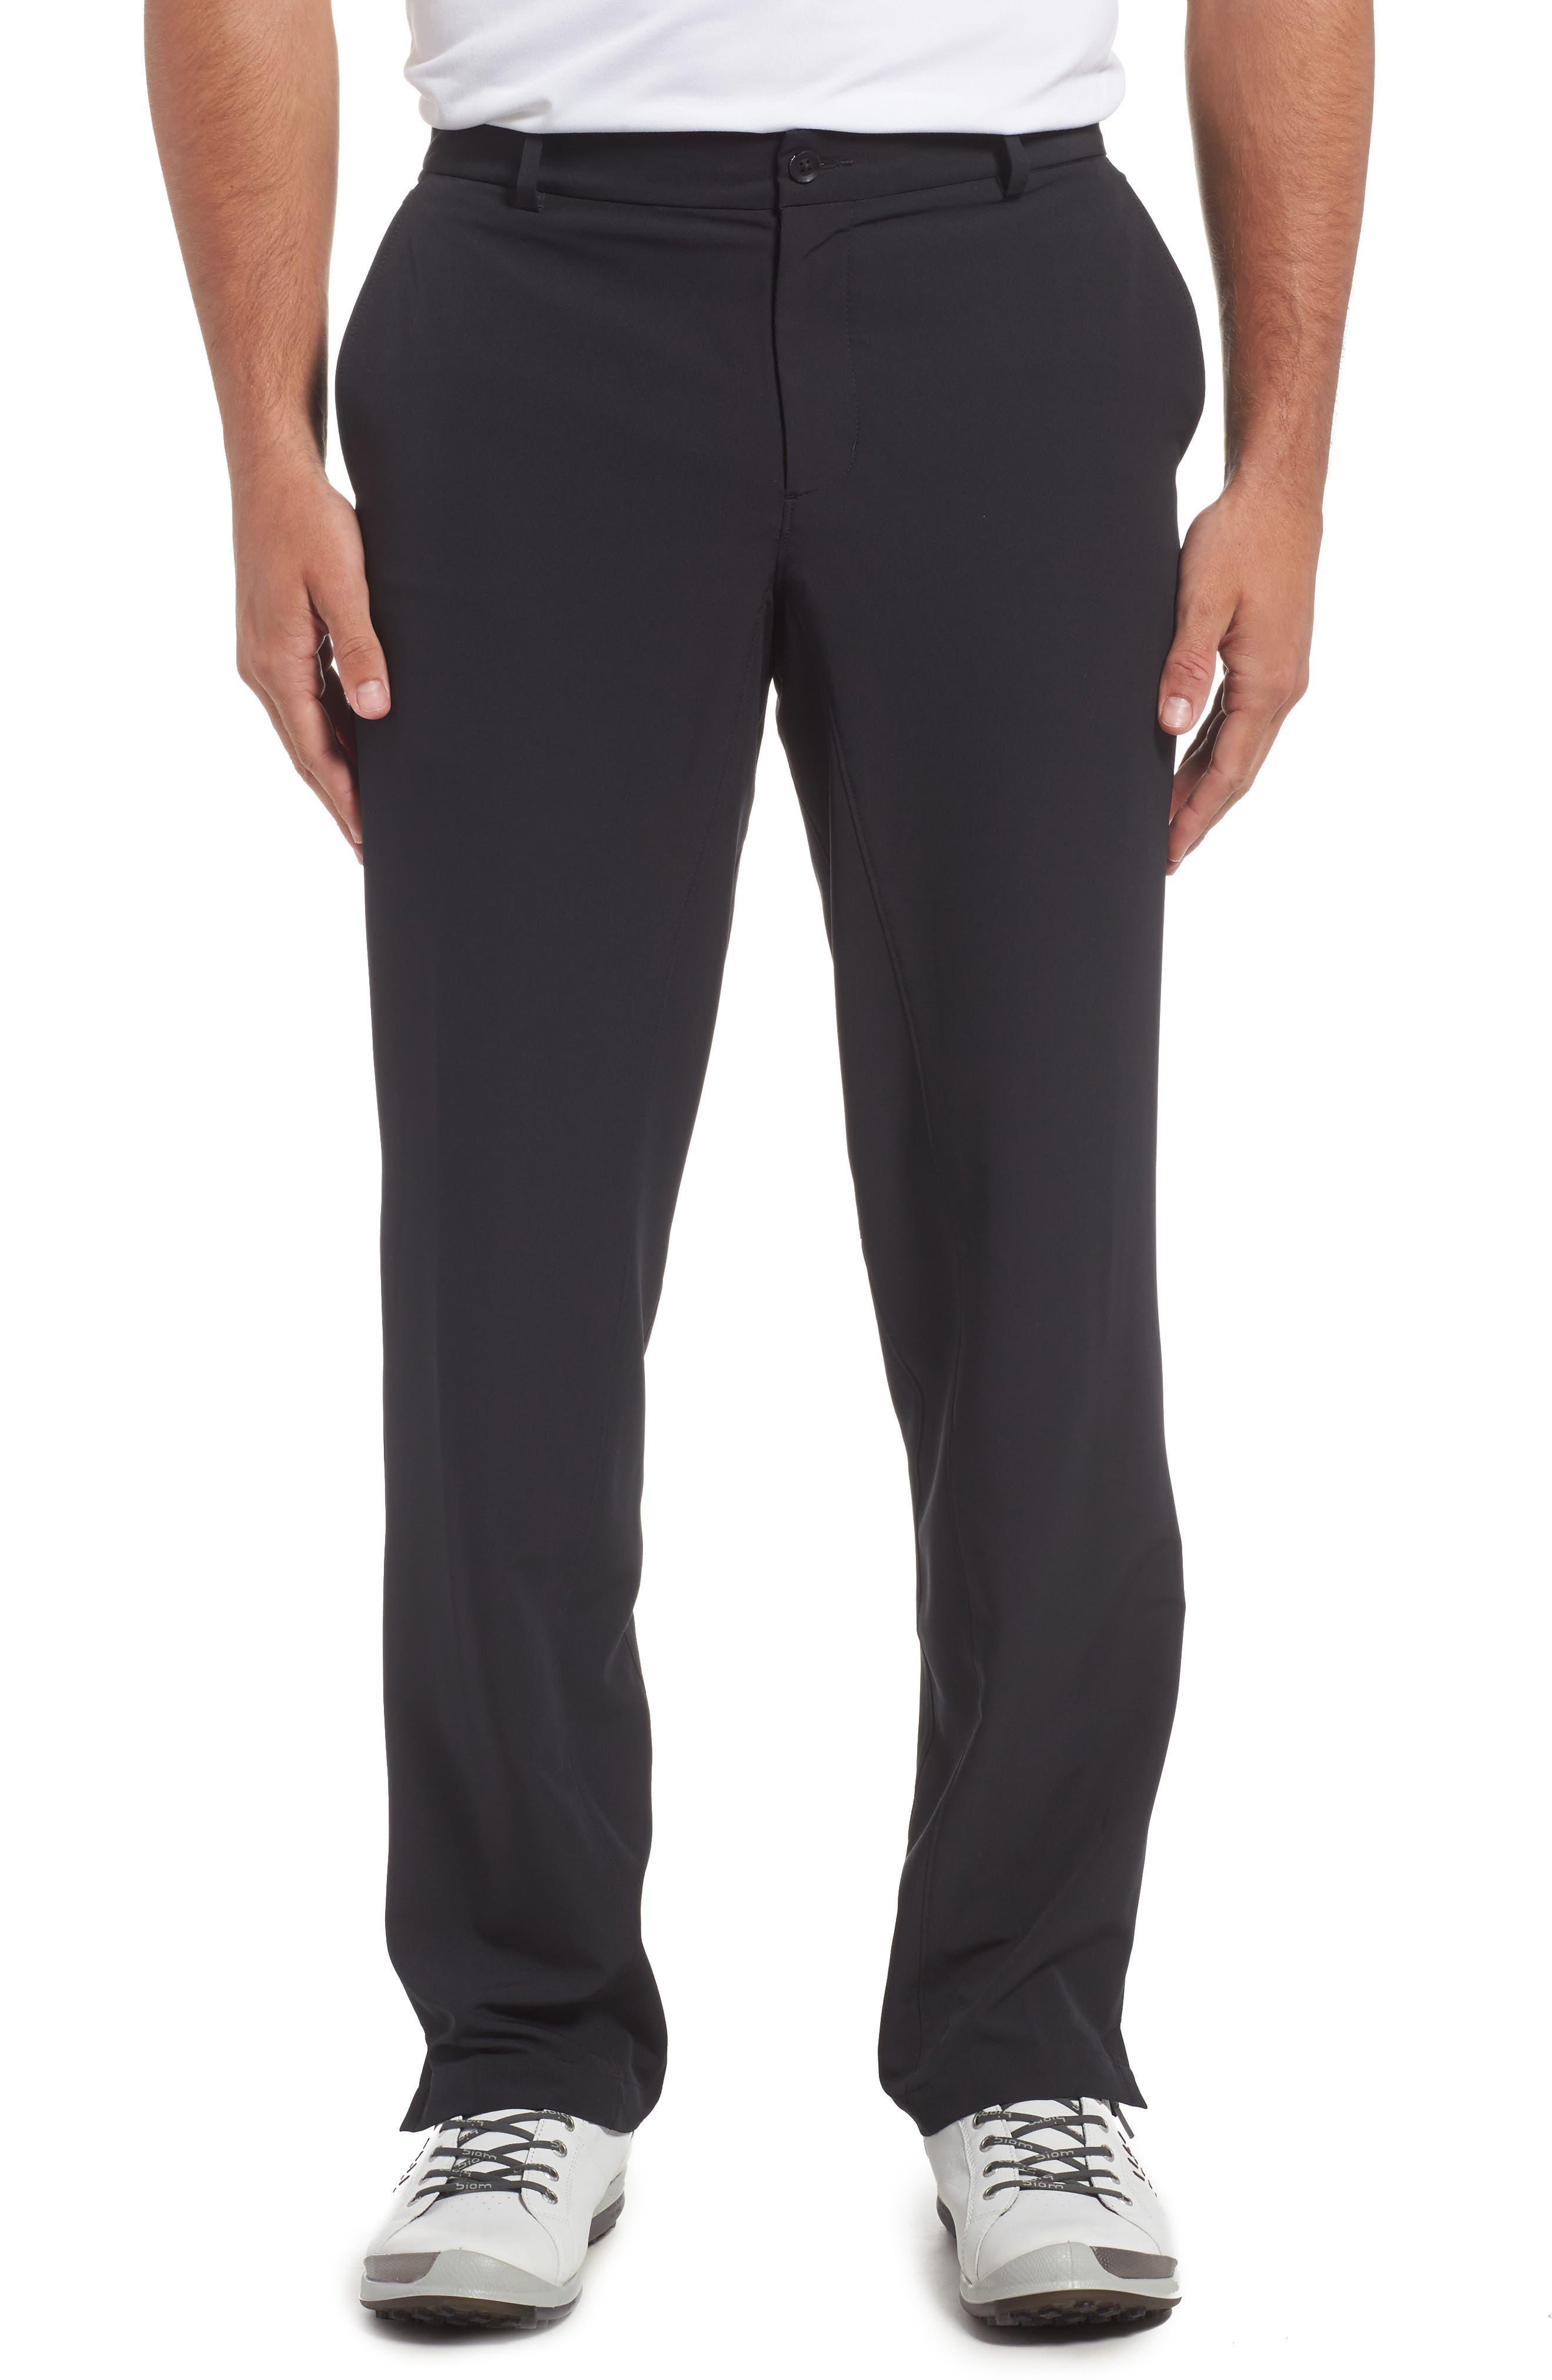 NIKE Hybrid Flex Golf Pants, Main, color, 010